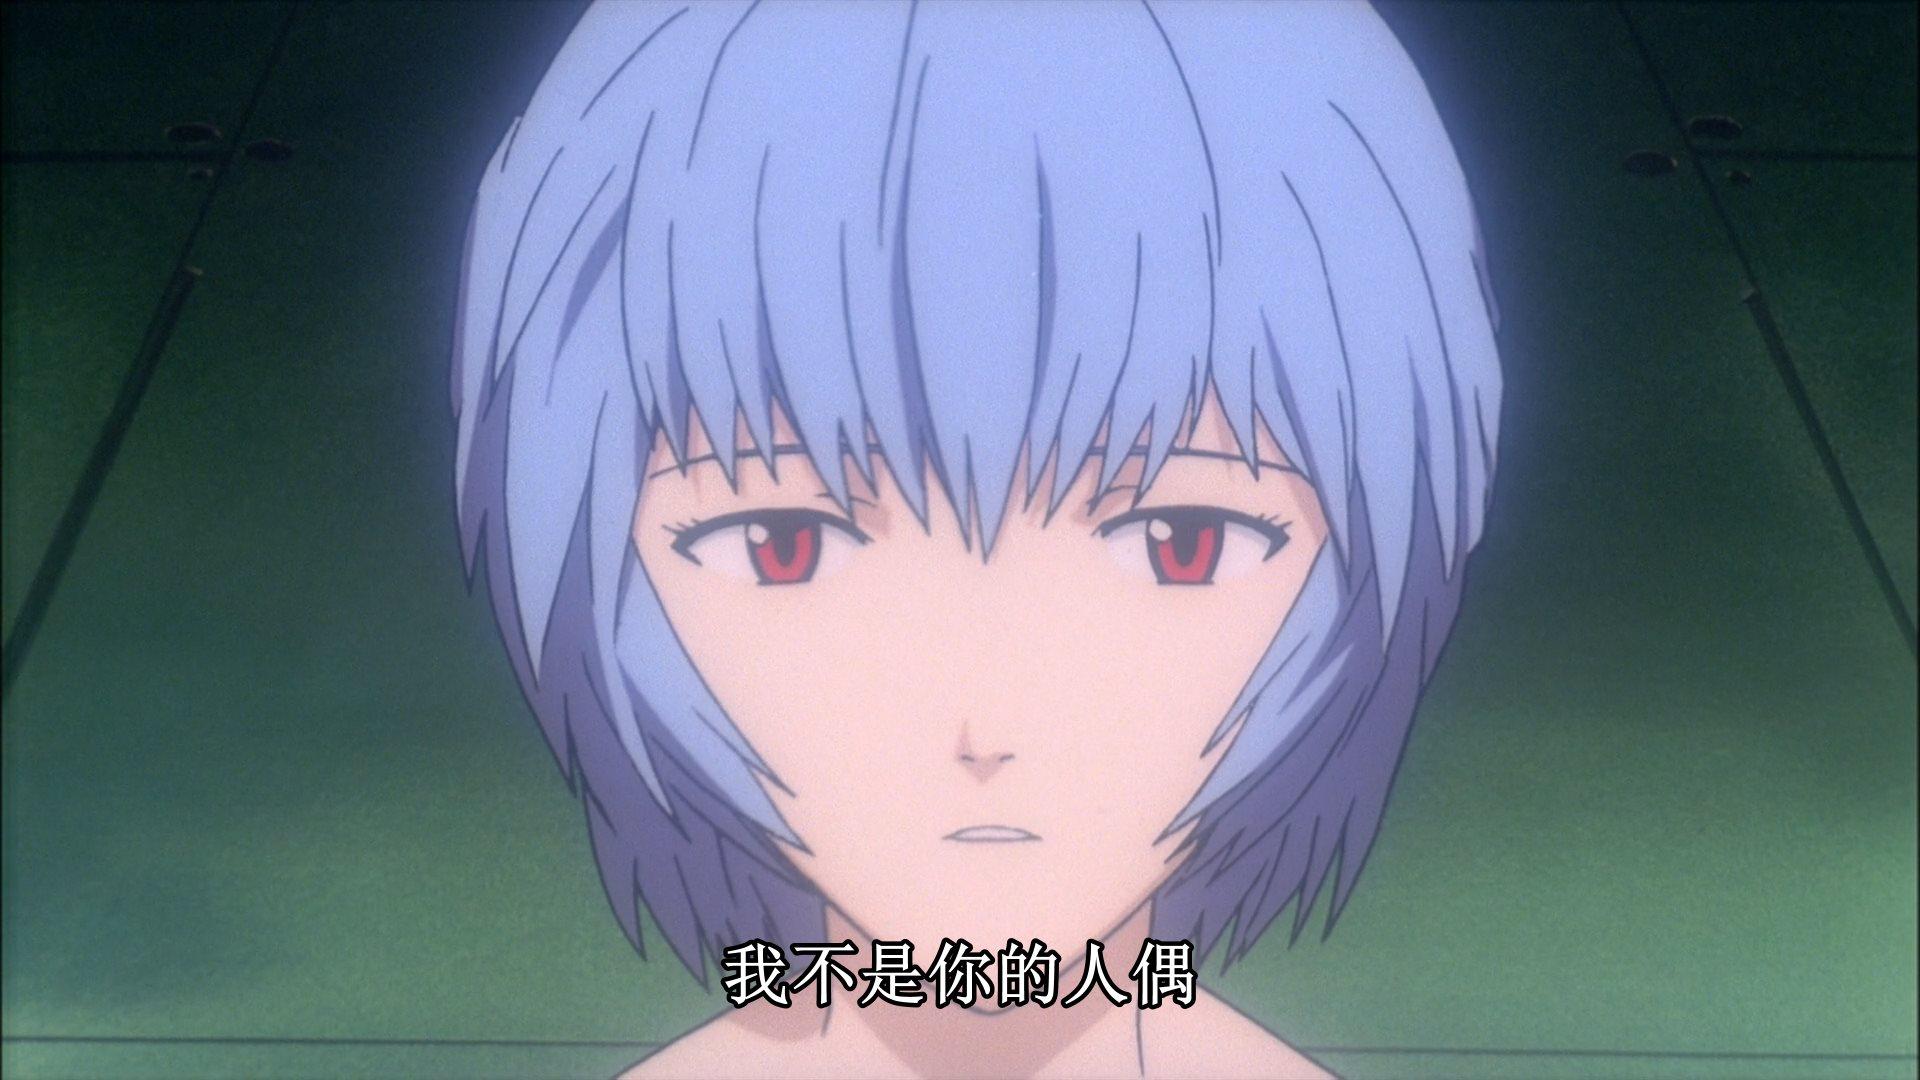 [Sephirotic] Evangelion -The End of Evangelion - 26' [MULTI][BD 1080p 8bits.jpg